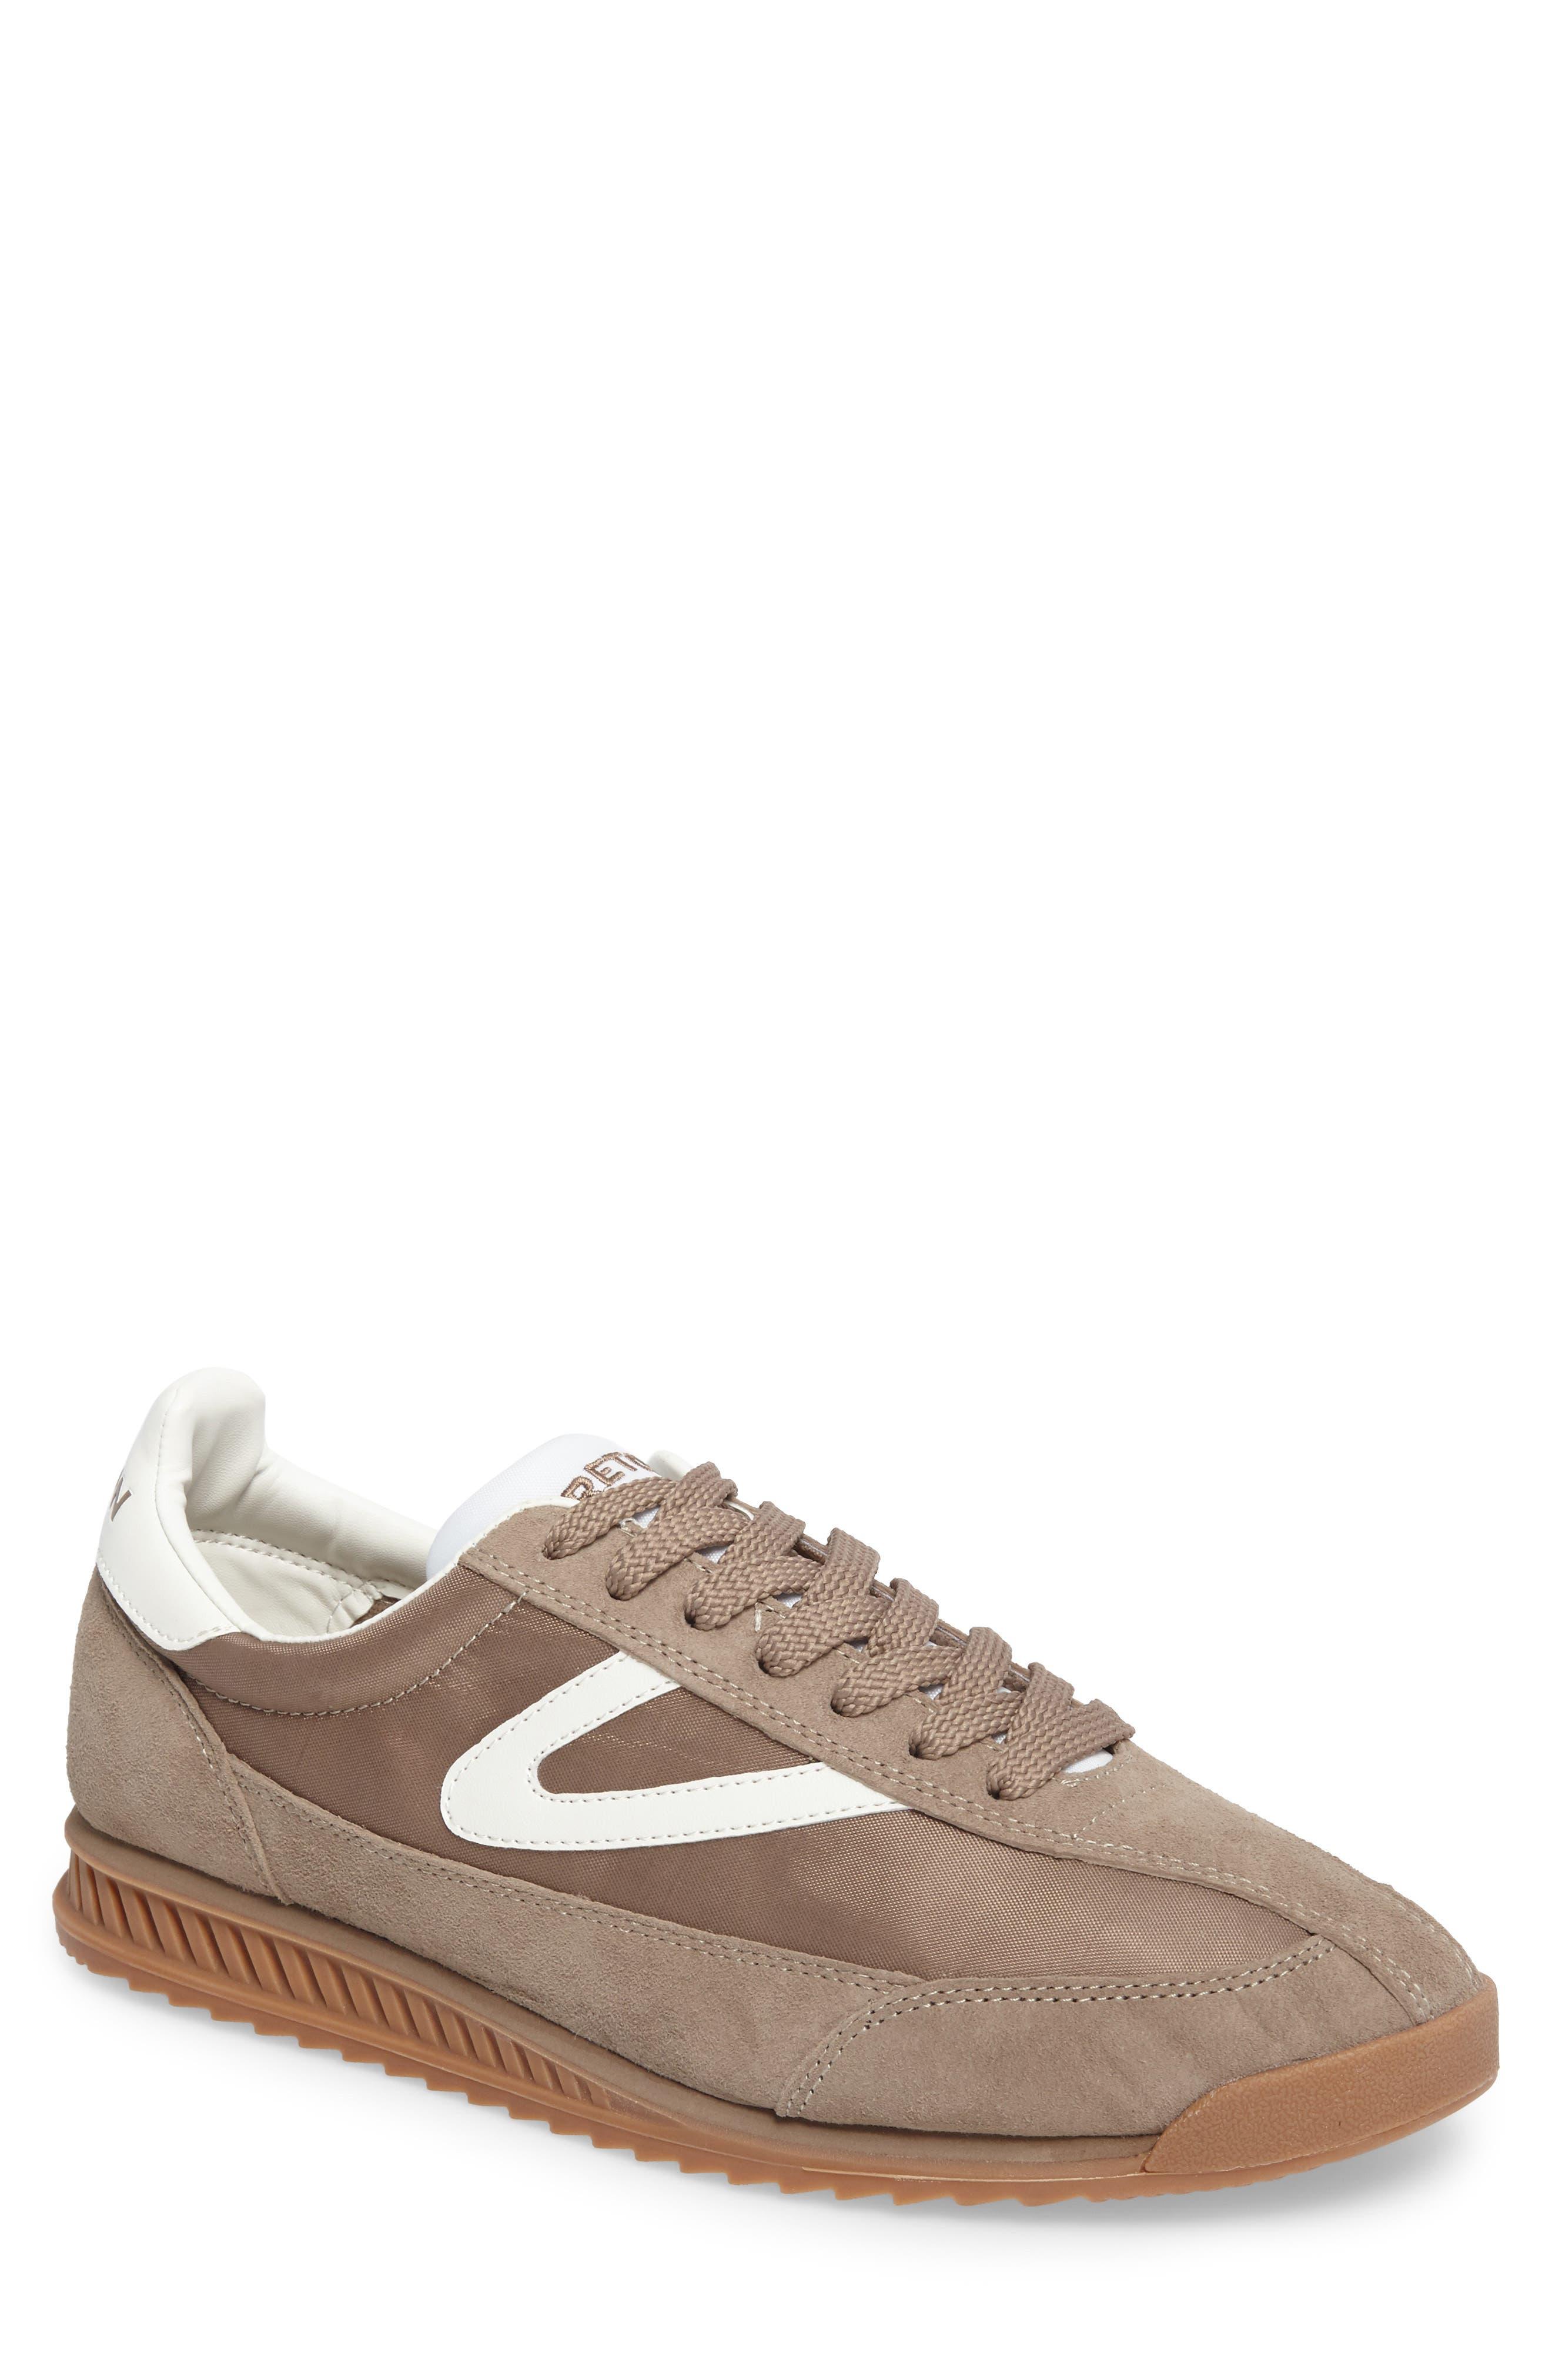 Tretorn Rawlins 3 Sneaker (Men)